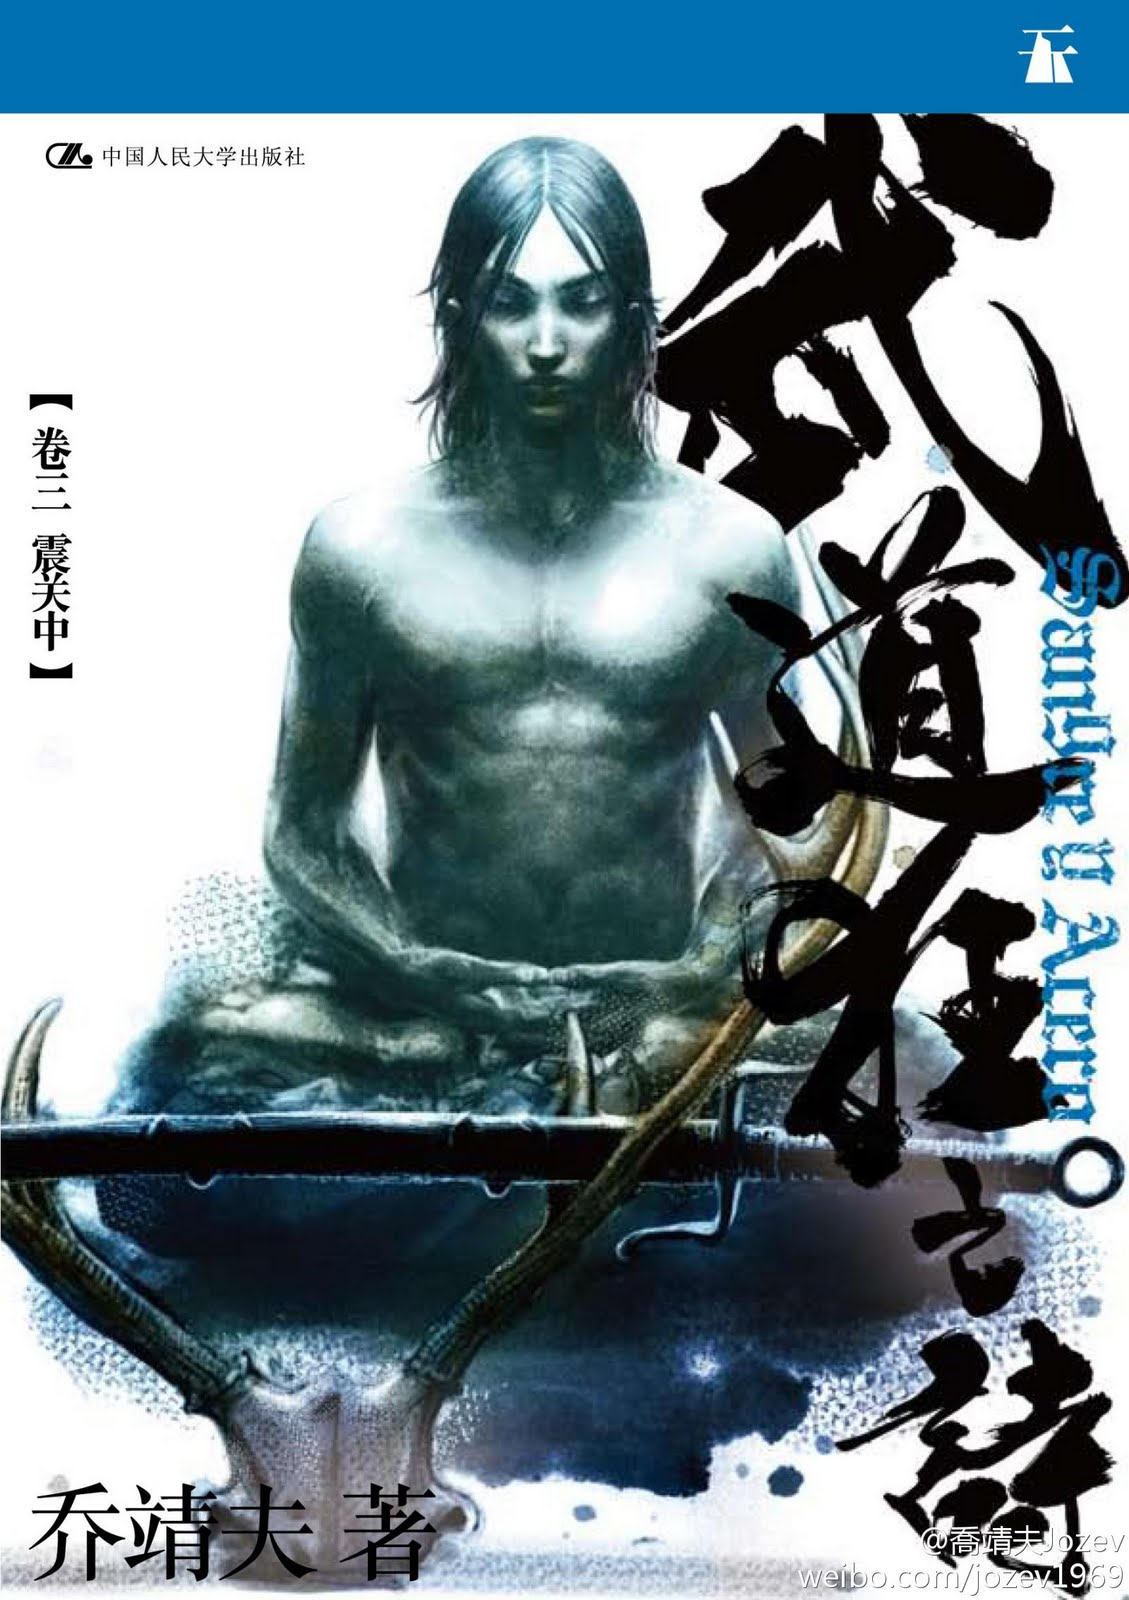 http://1.bp.blogspot.com/-9sFIemJgU9M/TsFFoZAw8yI/AAAAAAAAKyY/b0oE4b2D-VI/s1600/Novel-bk-03-cover.jpg